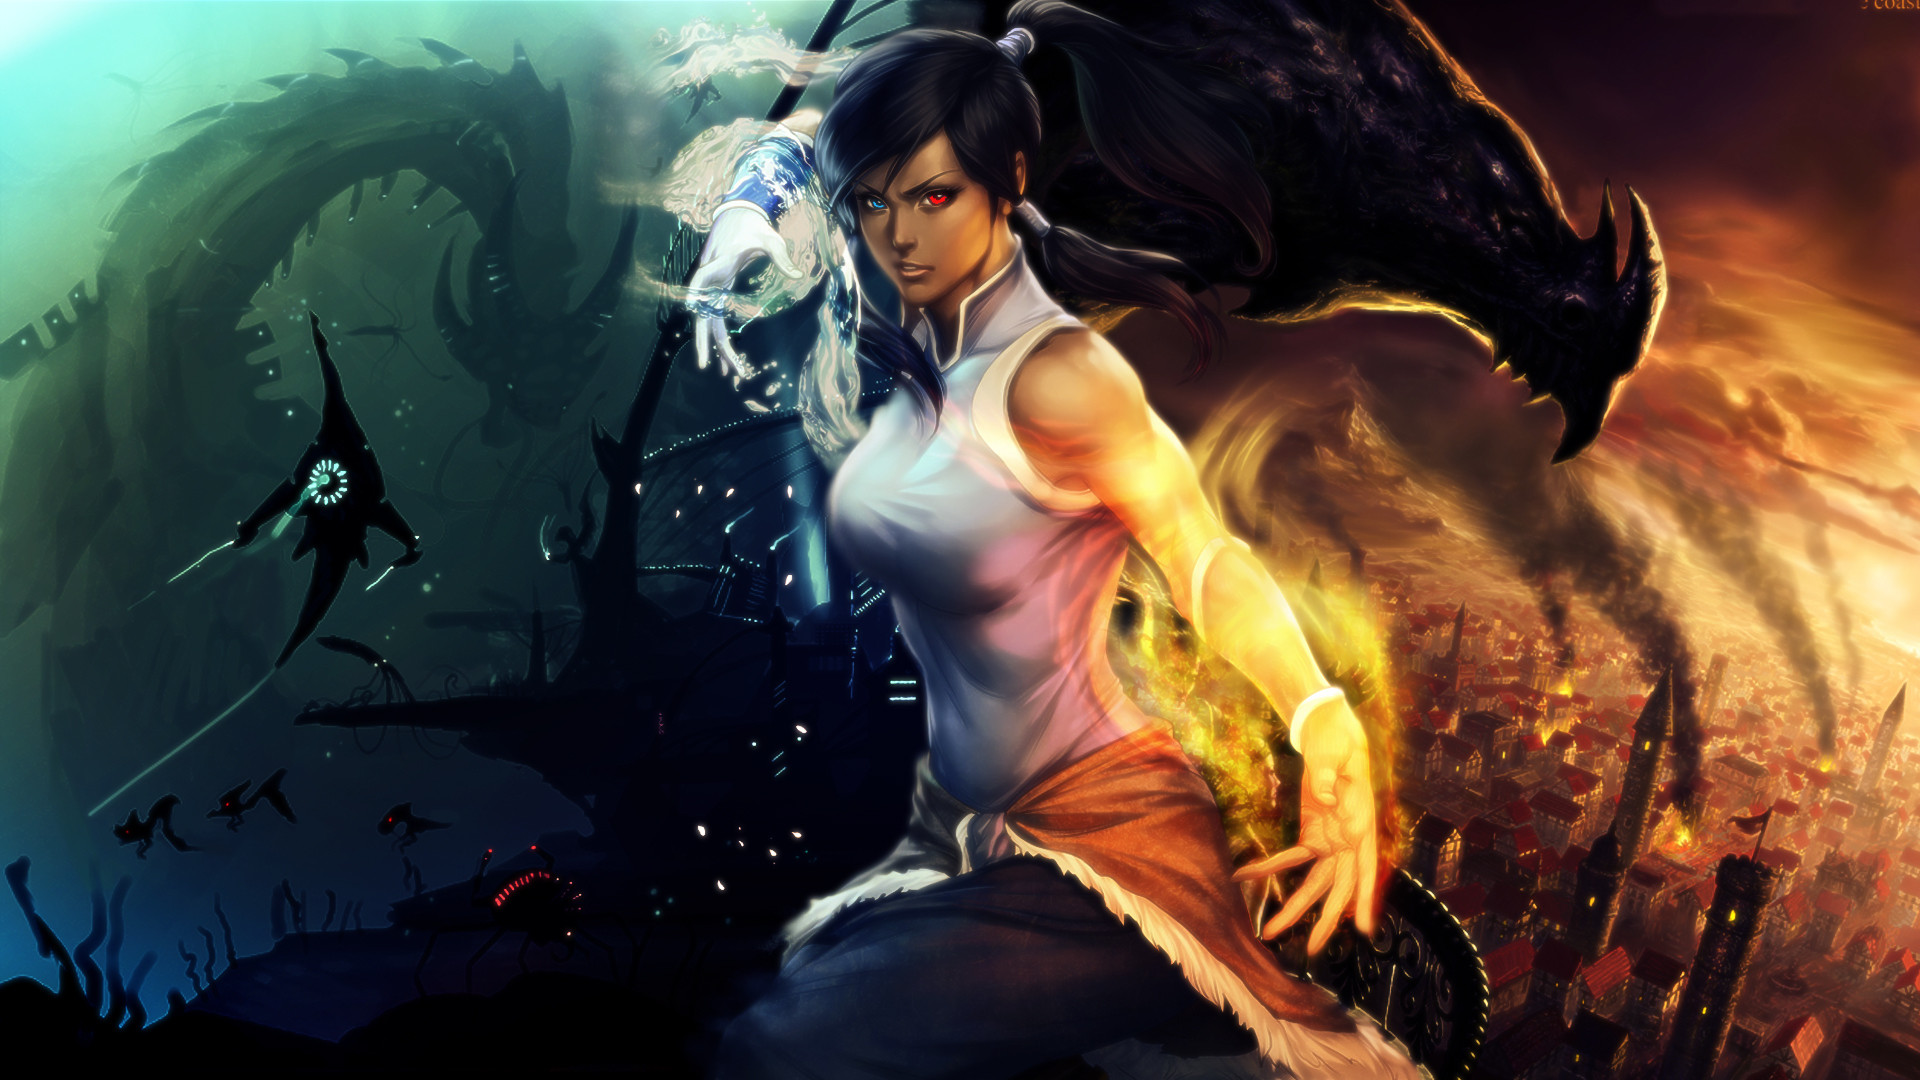 Avatar The Legend of Korra Magic Warrior Singlet Anime Girls Fantasy sci-fi  dragon wallpaper | | 166314 | WallpaperUP